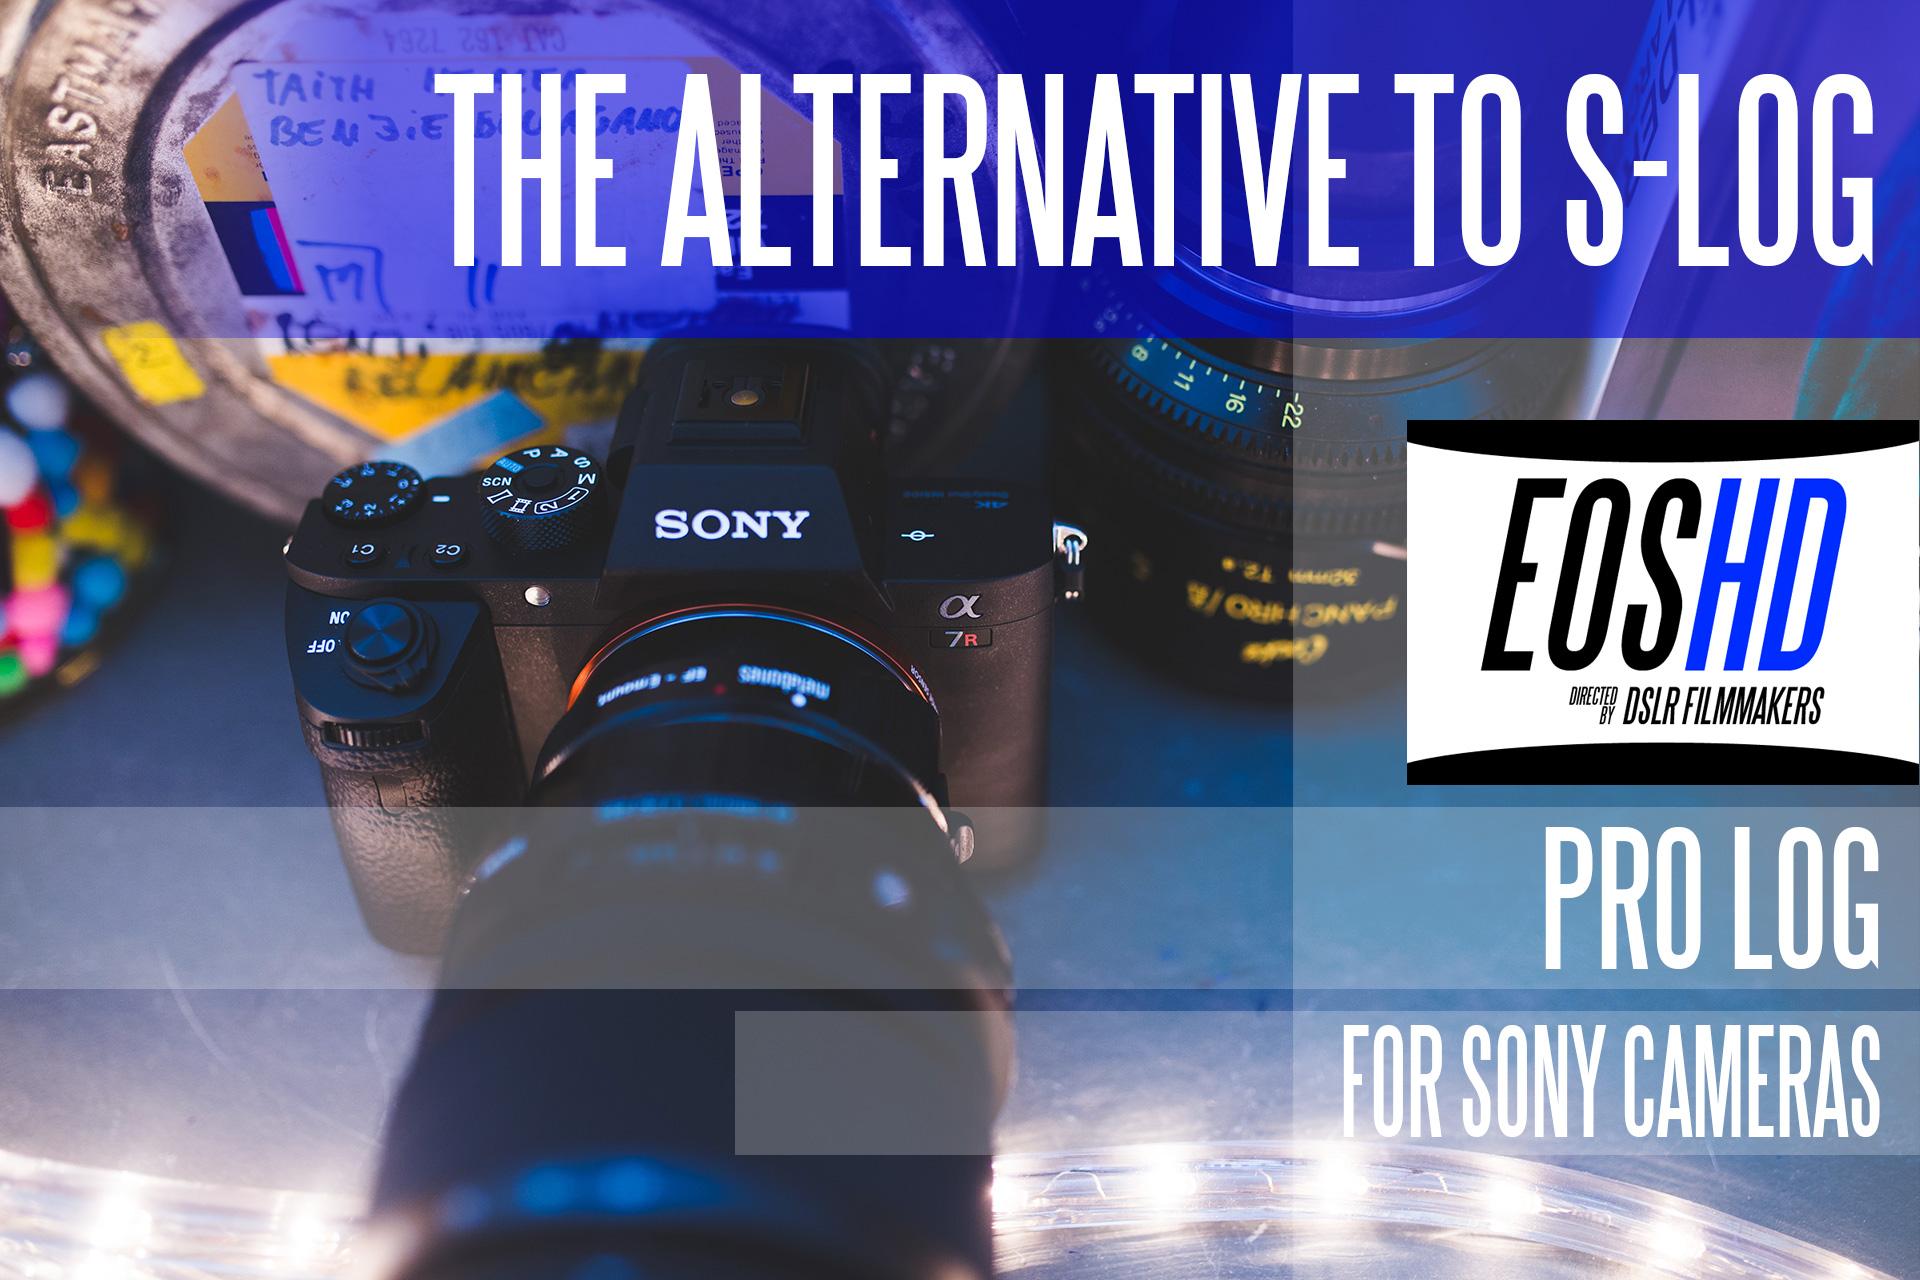 EOSHD Pro LOG for Sony Cameras (a7S II, a7R II, a6300 and